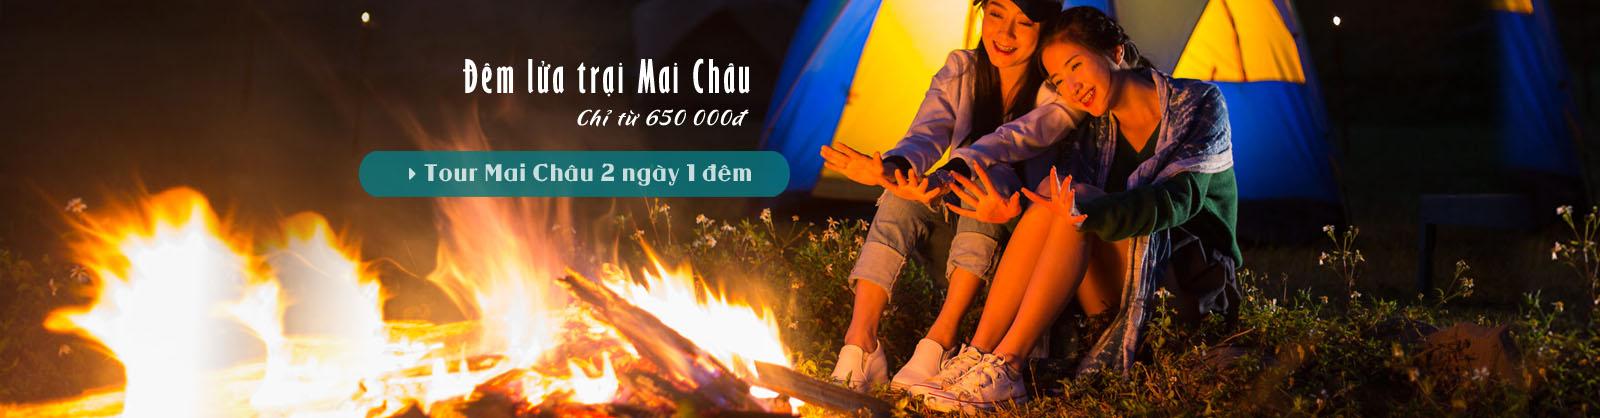 Đêm lửa trại Mai Châu